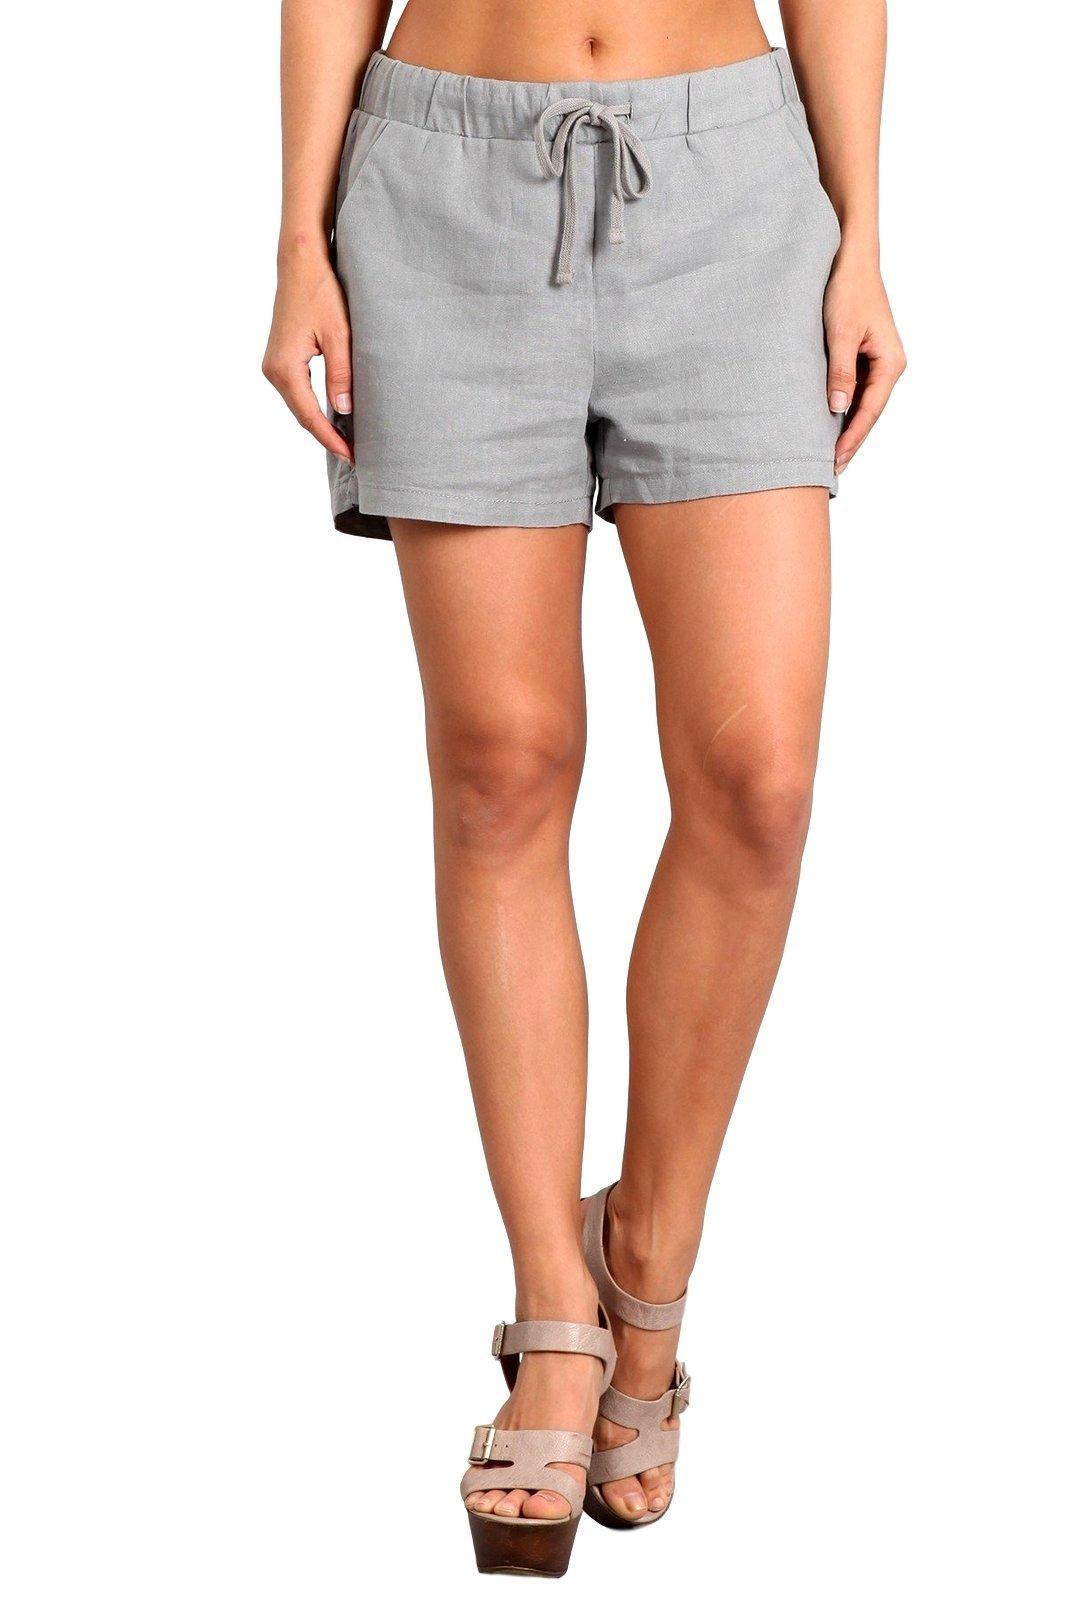 Celebrity Pink Women's High Rise Linen Shorts Small Griffin CJ31097GX